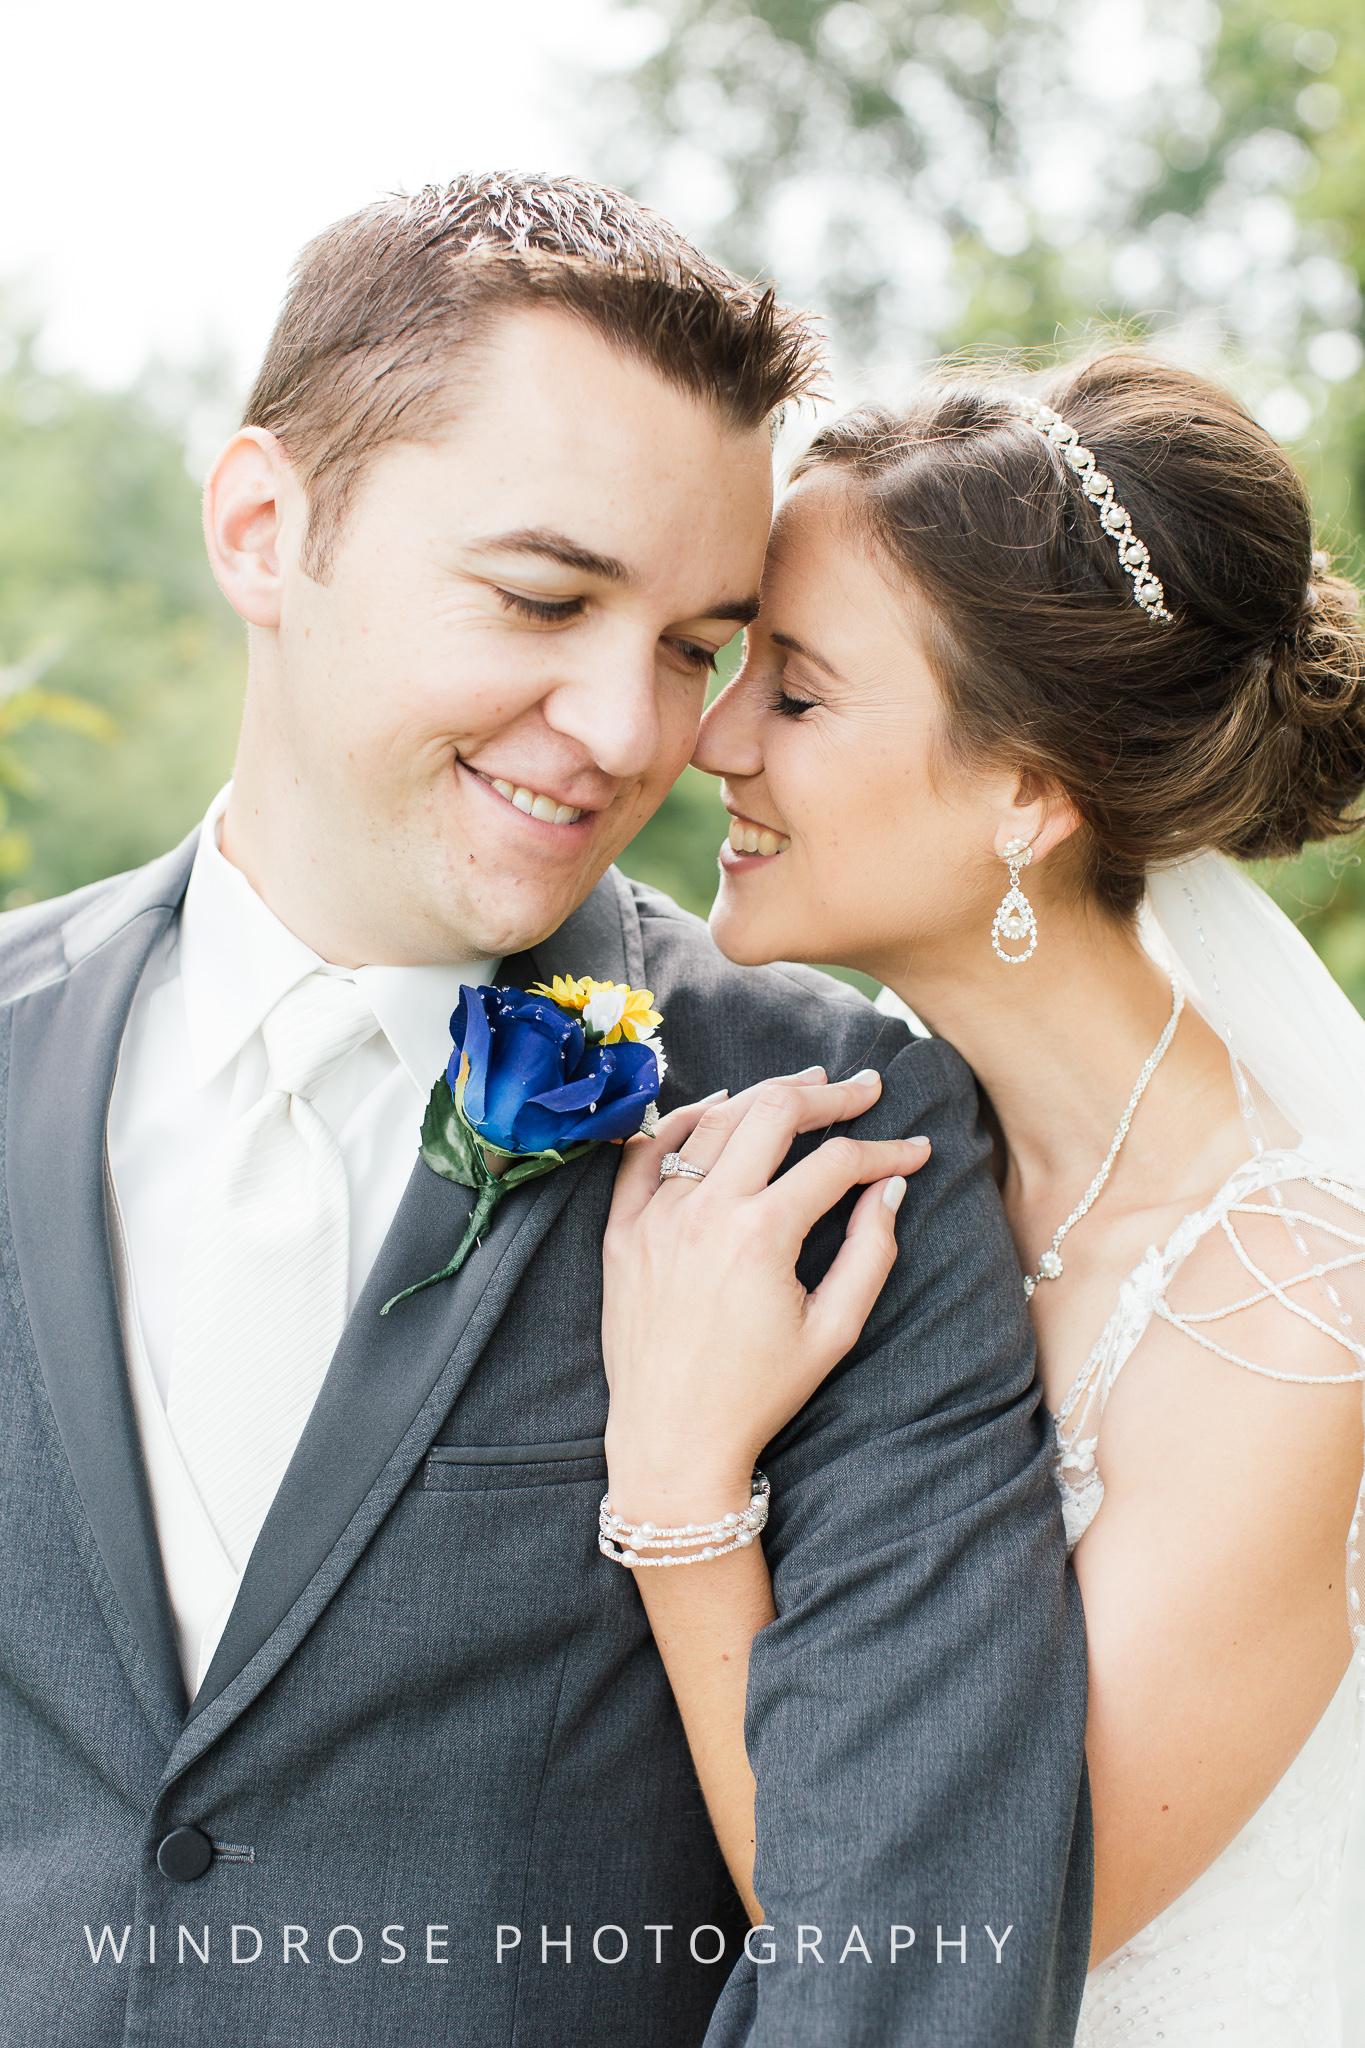 La-Crosse-Country-Club-Wedding-Minnesota-Wedding-Photographer-14.jpg